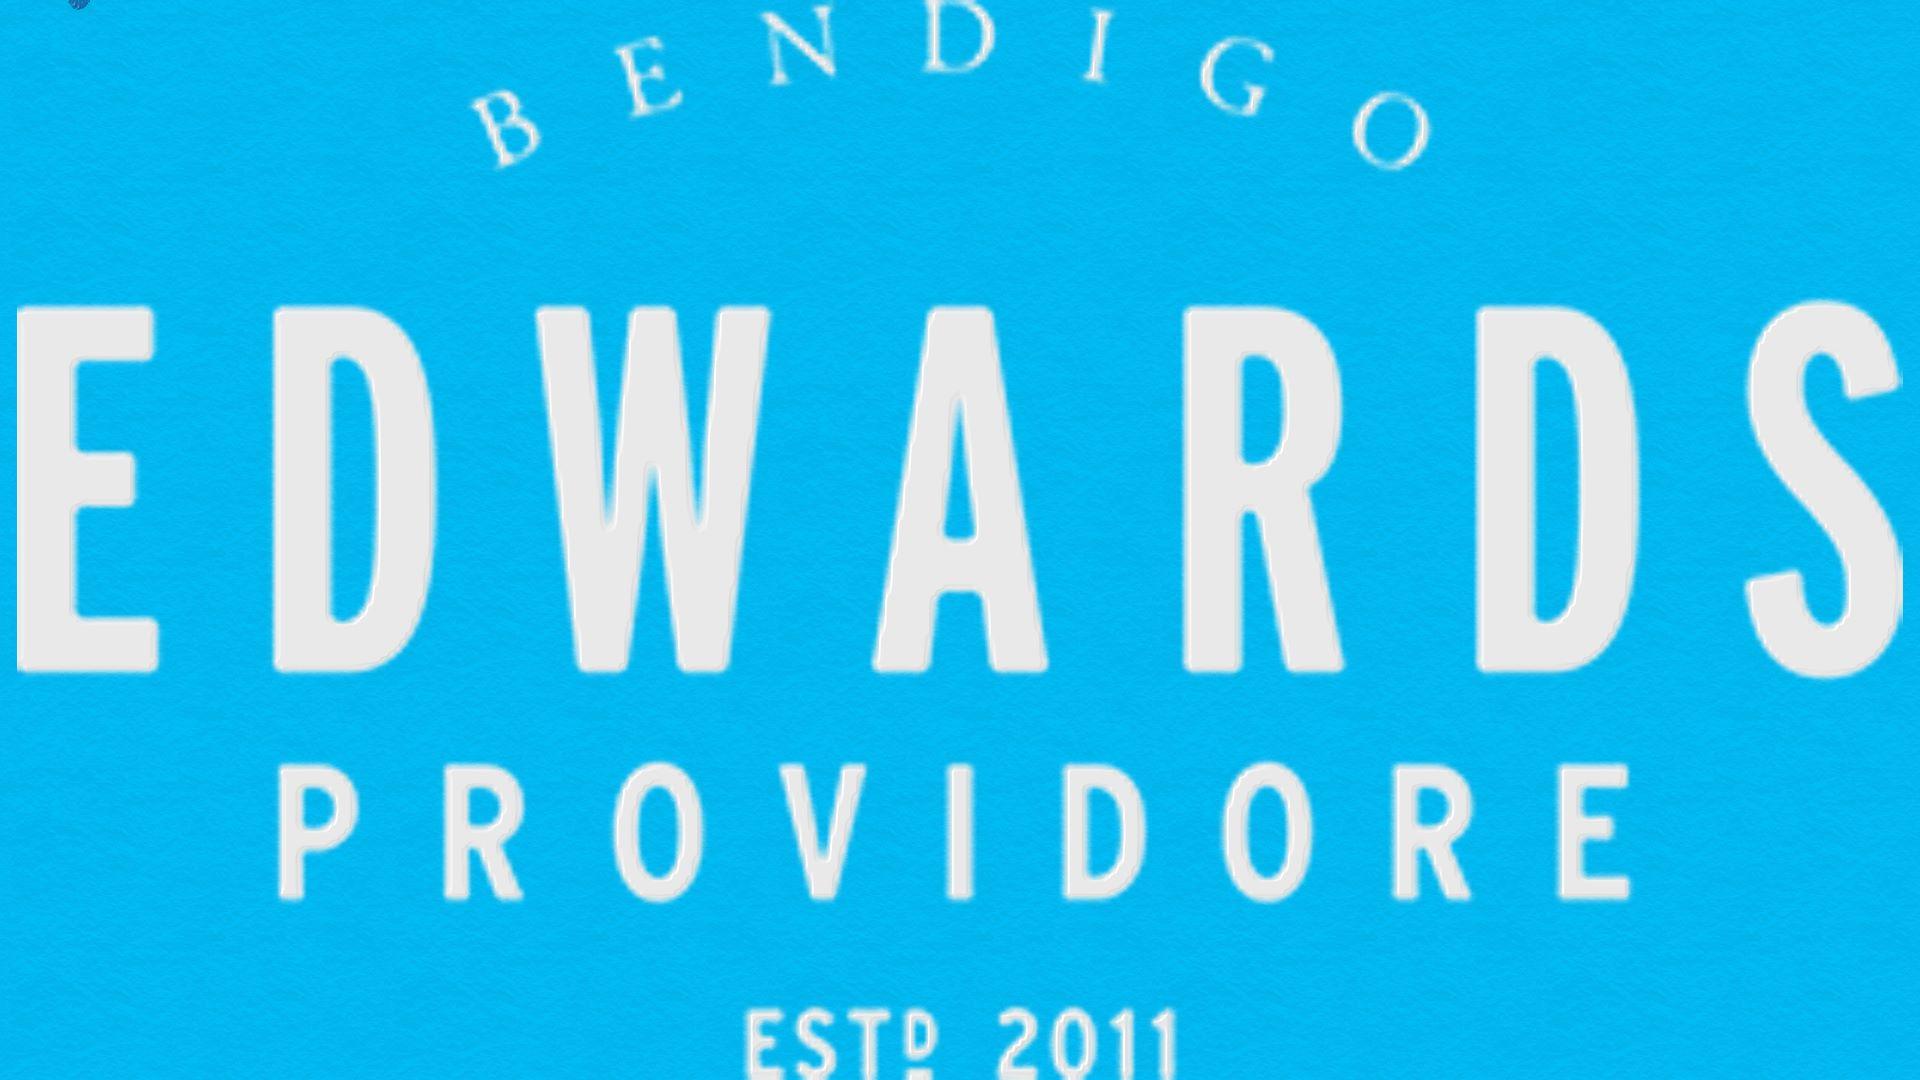 Edwards Providore